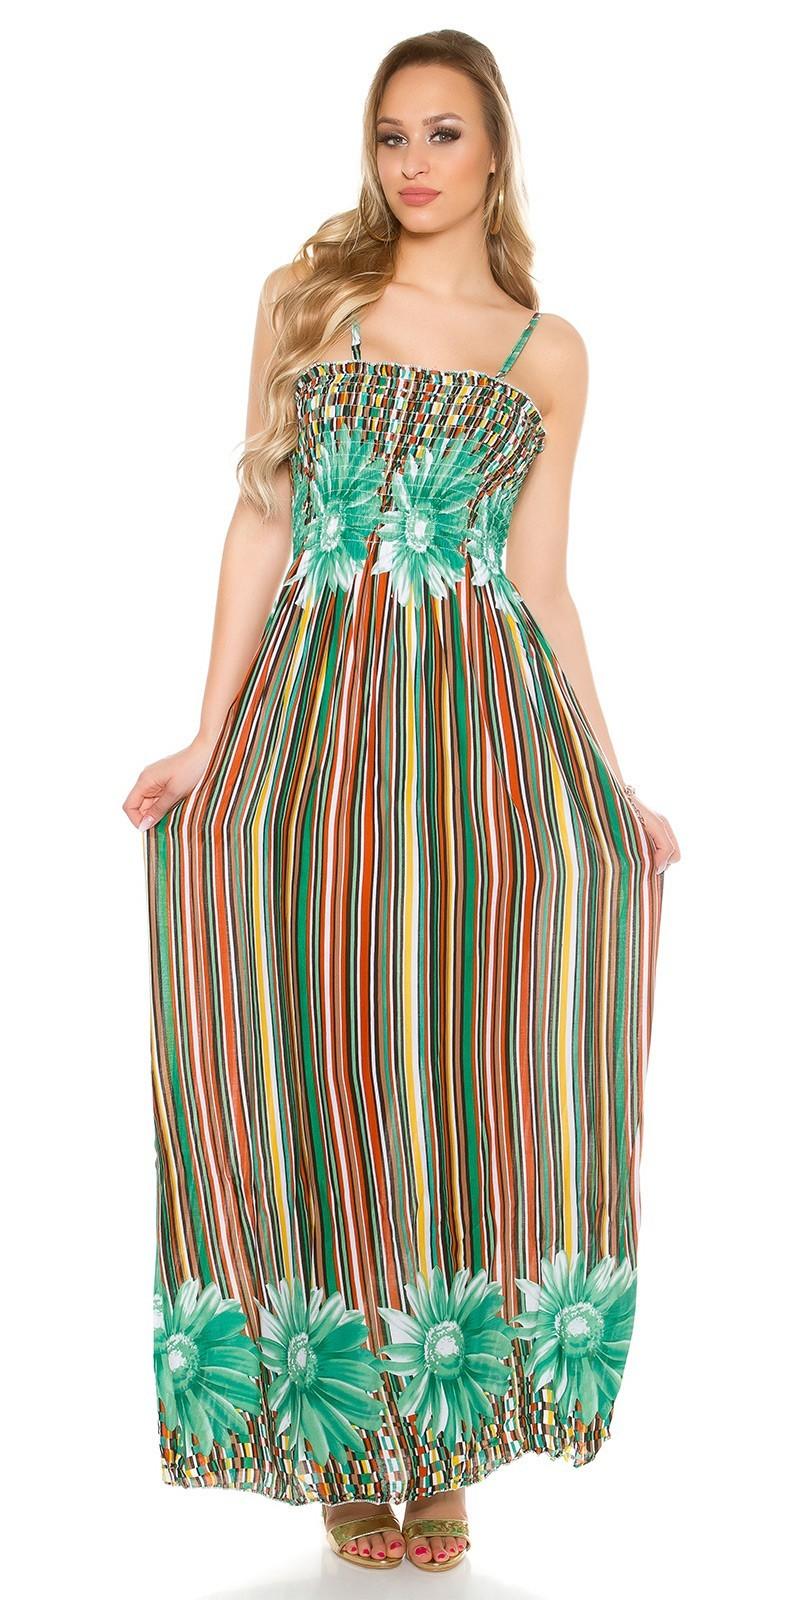 59490c91d7c0 Dlhé letné šaty na ramienka Green – Sissy Boutique